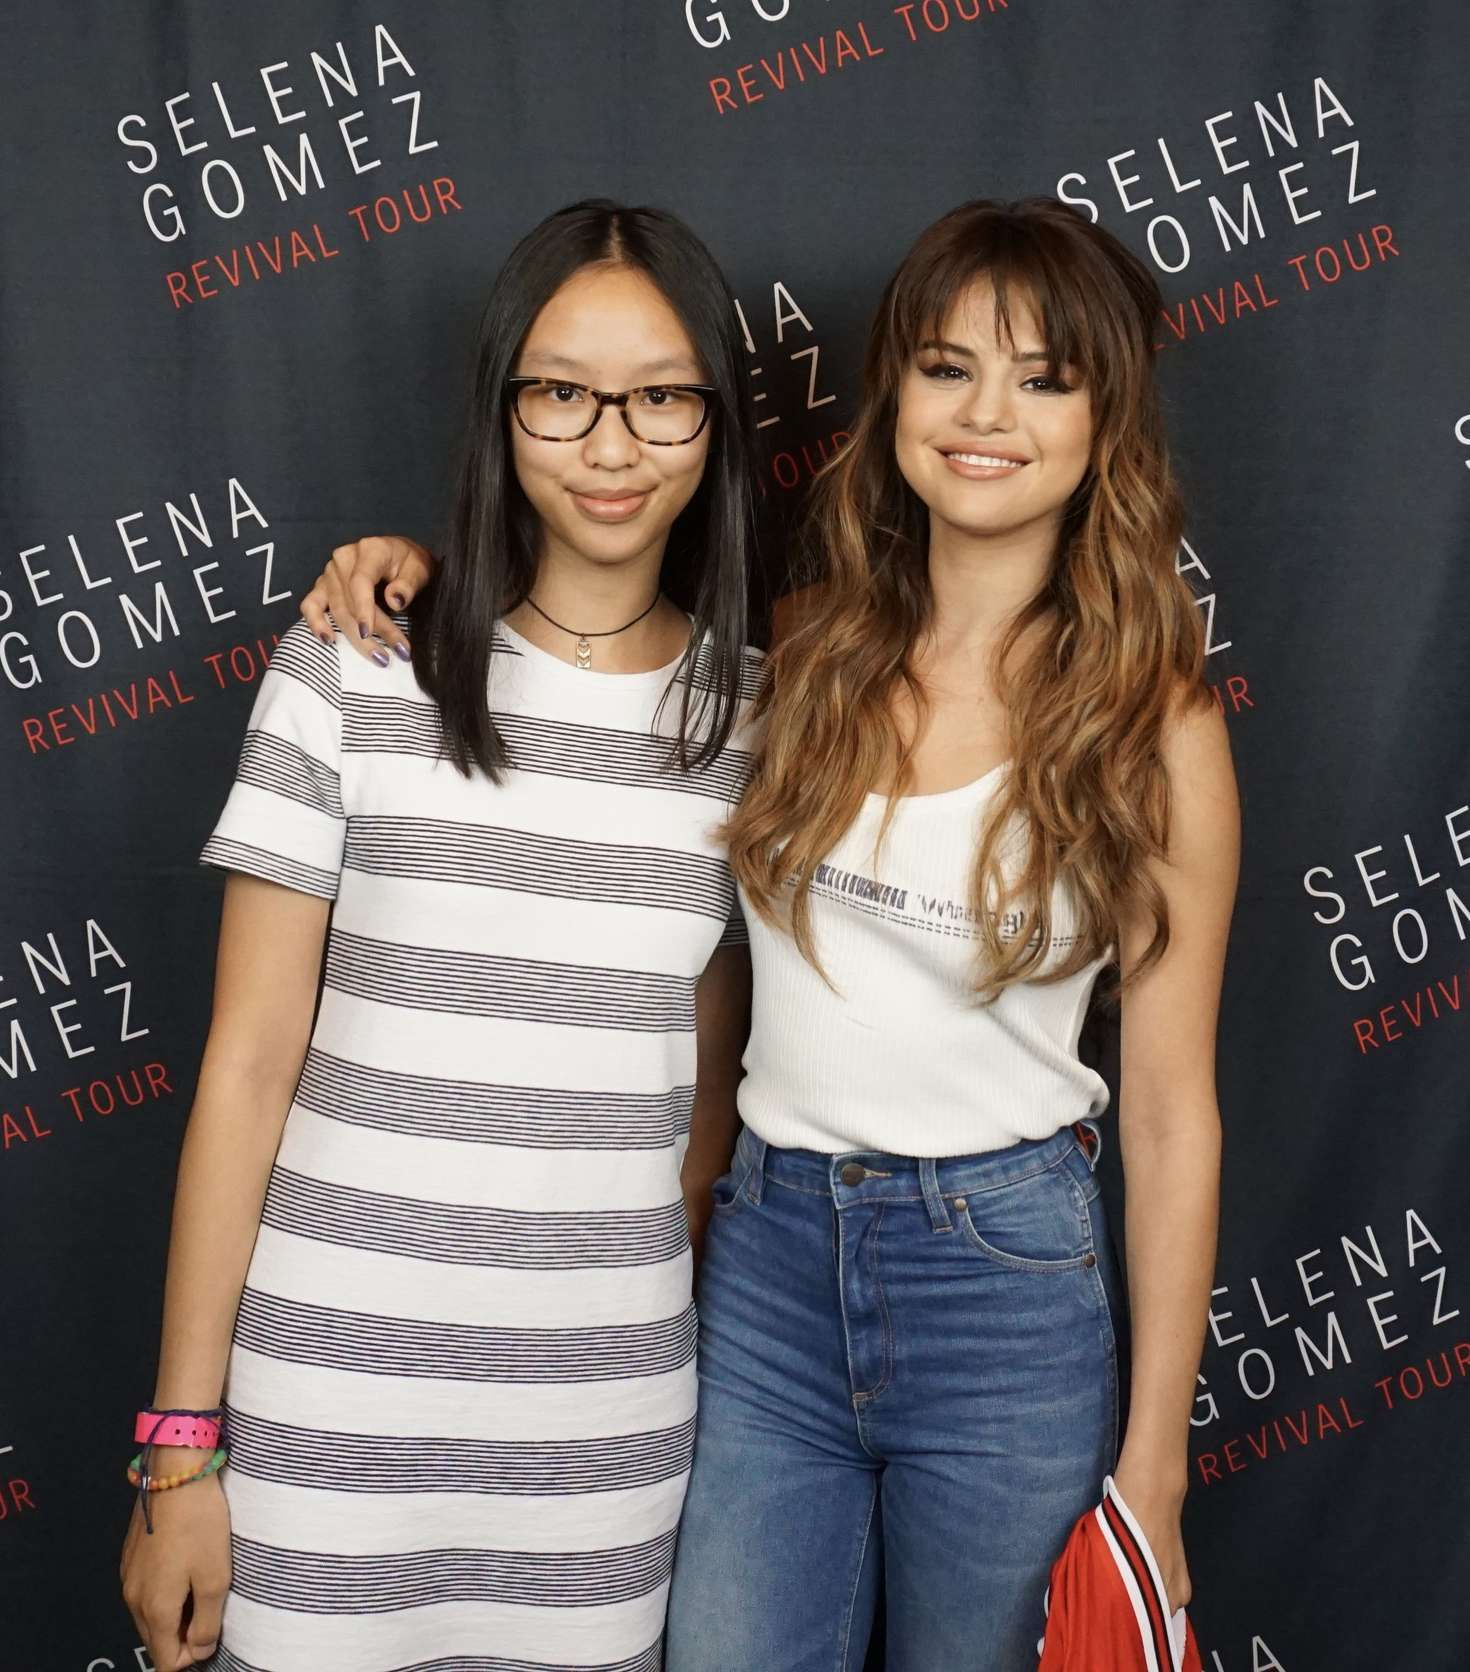 Selena Gomez Revival Tour Meet And Greet Google Search Hair